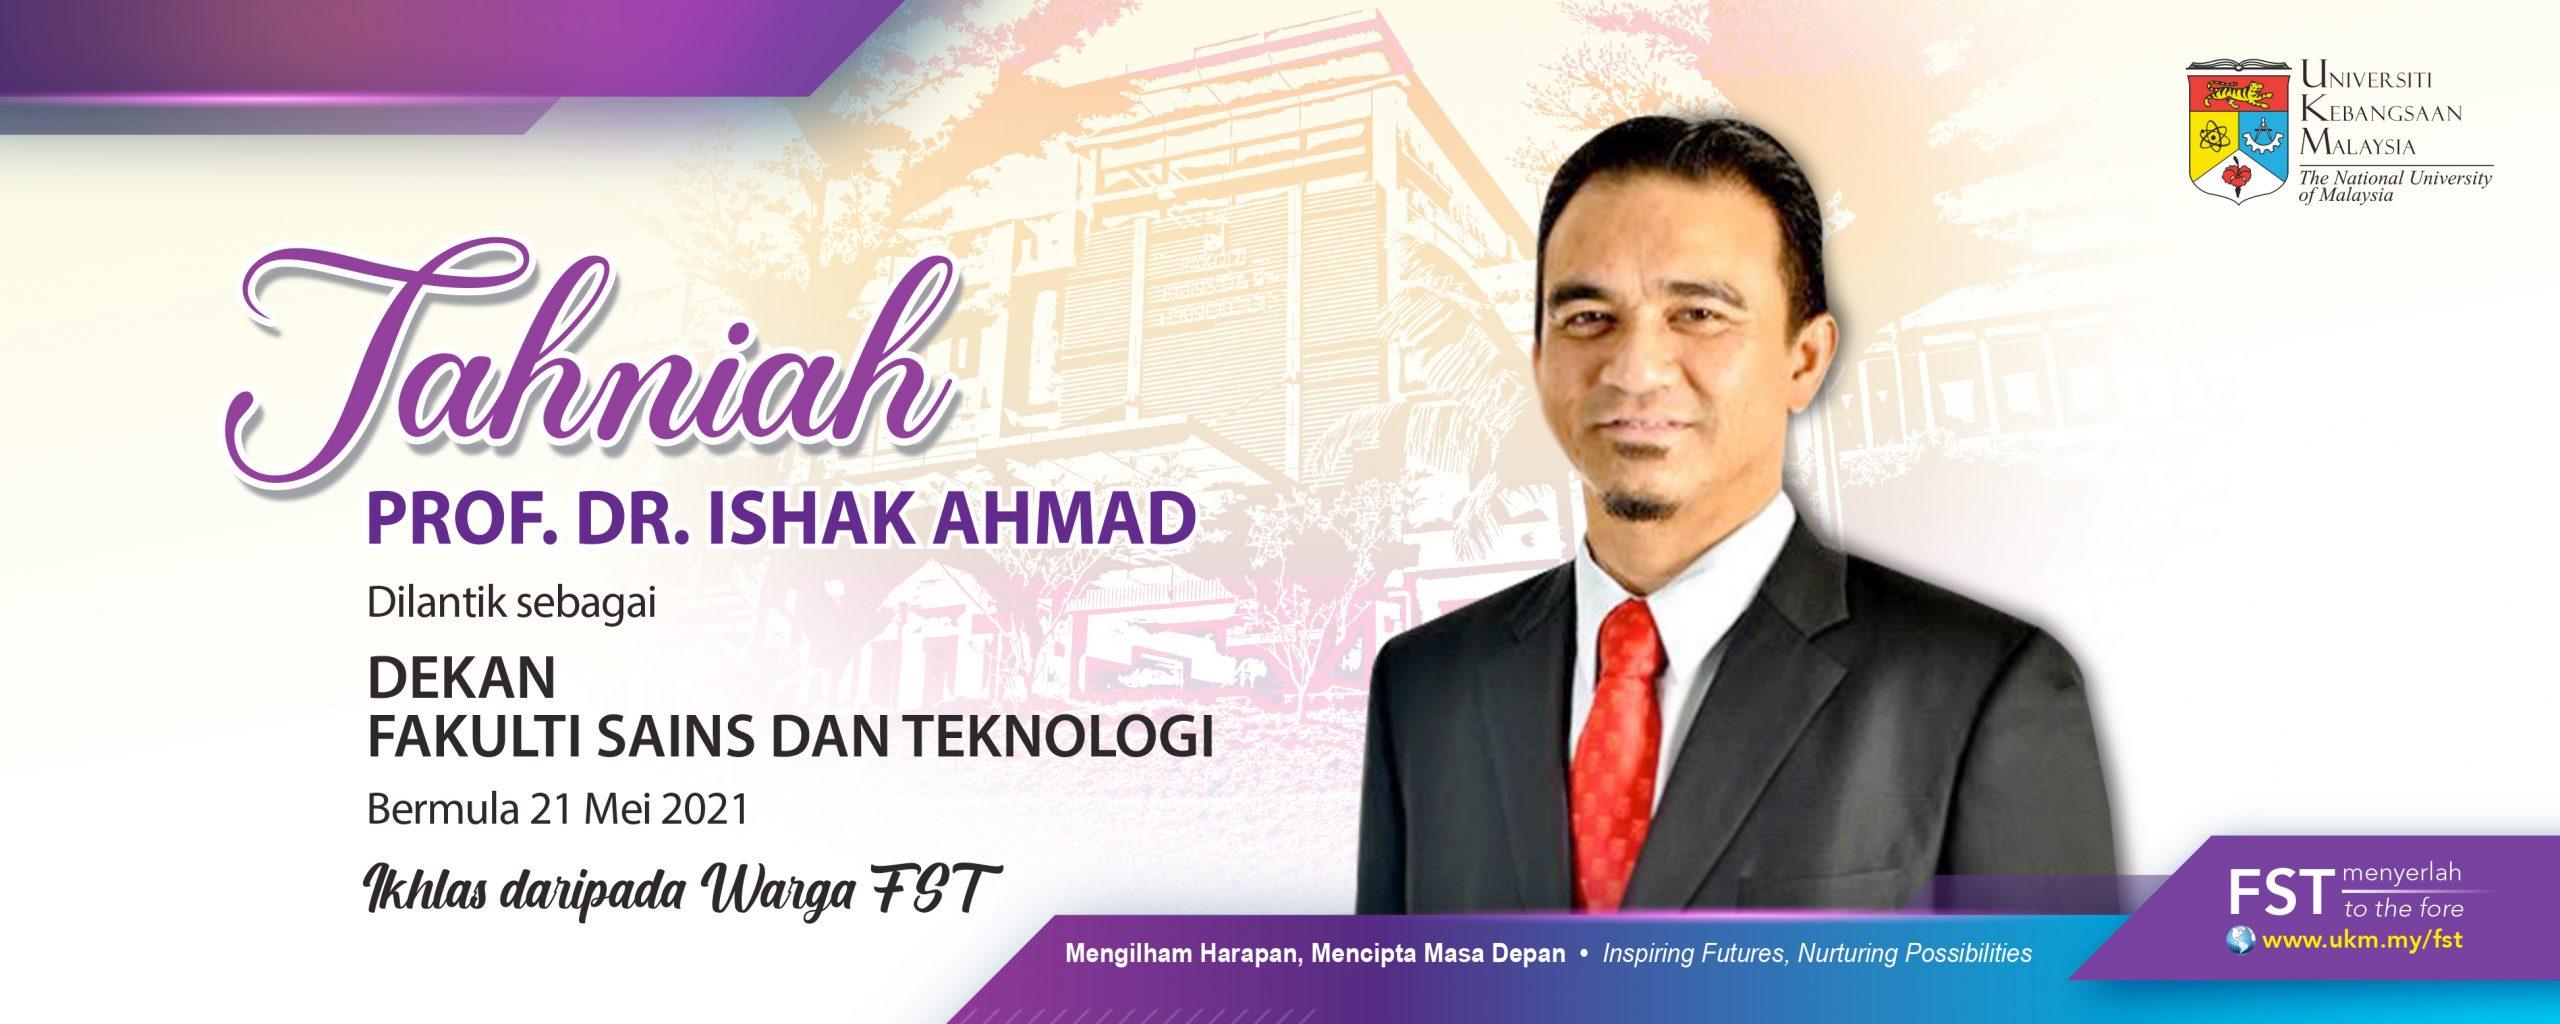 Tahniah Dekan Prof. Dr. Ishak